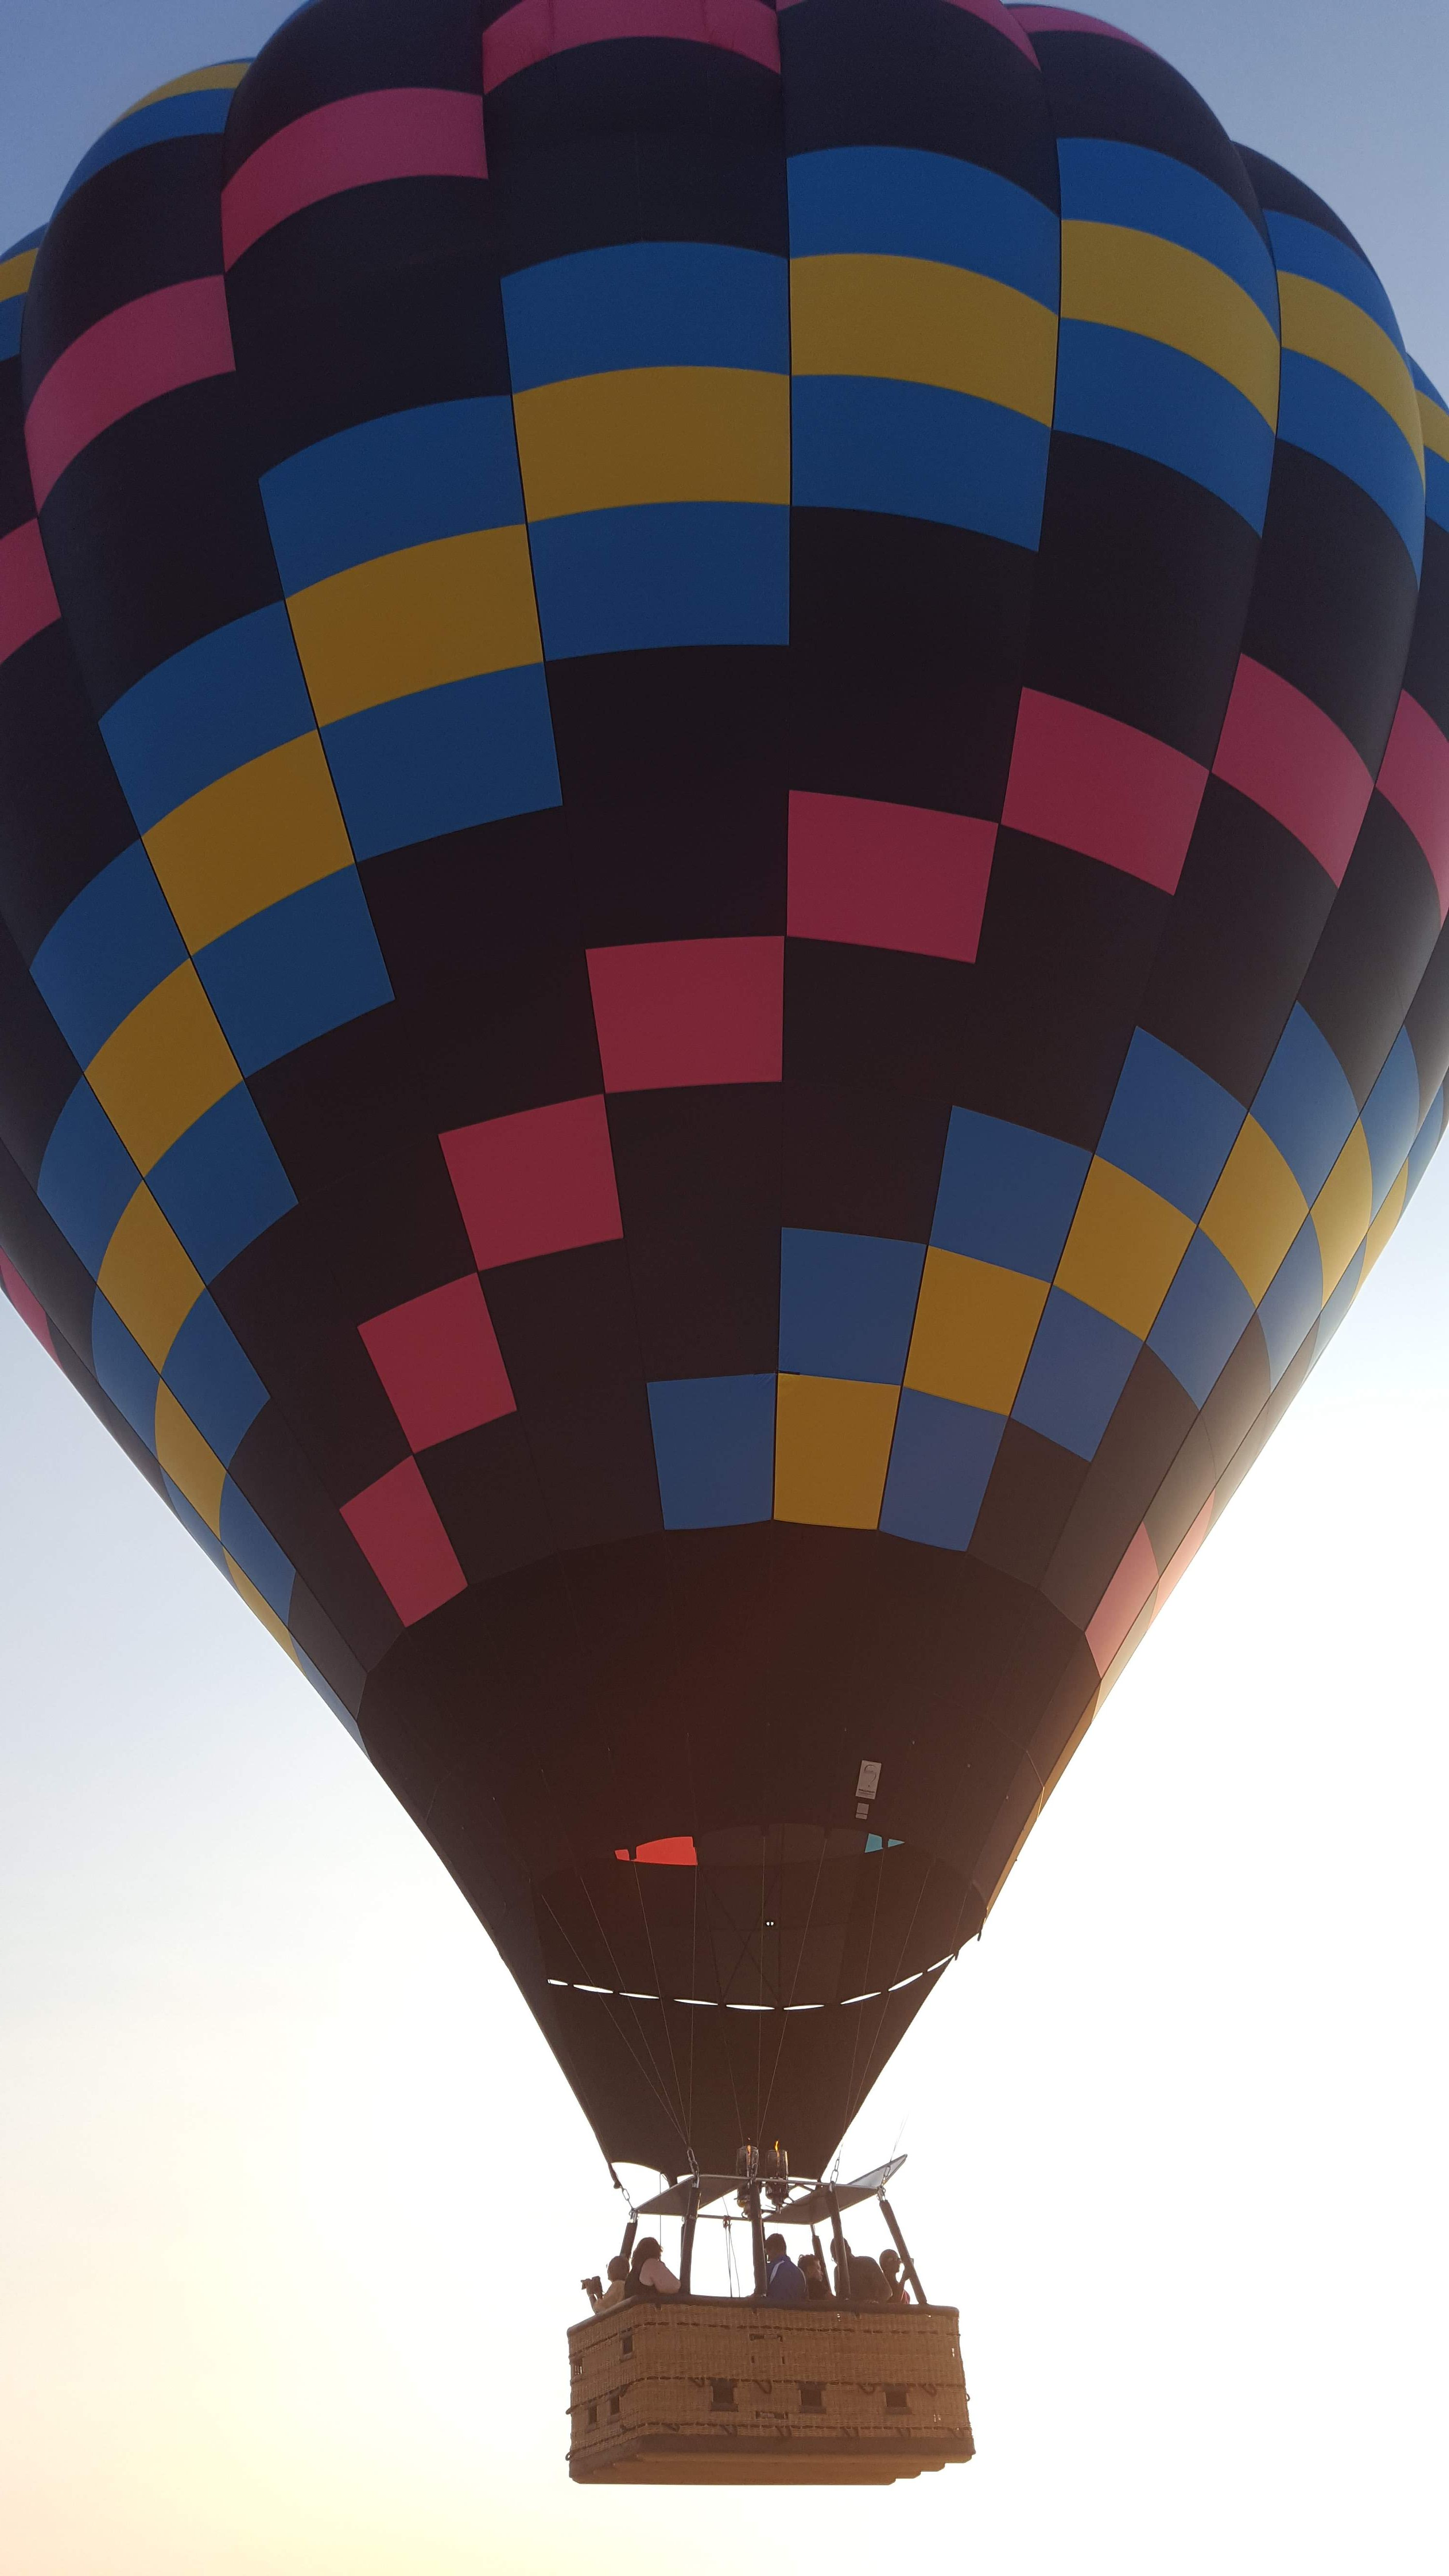 Hot air balloon rides image by Vegas Hot Air Sin City